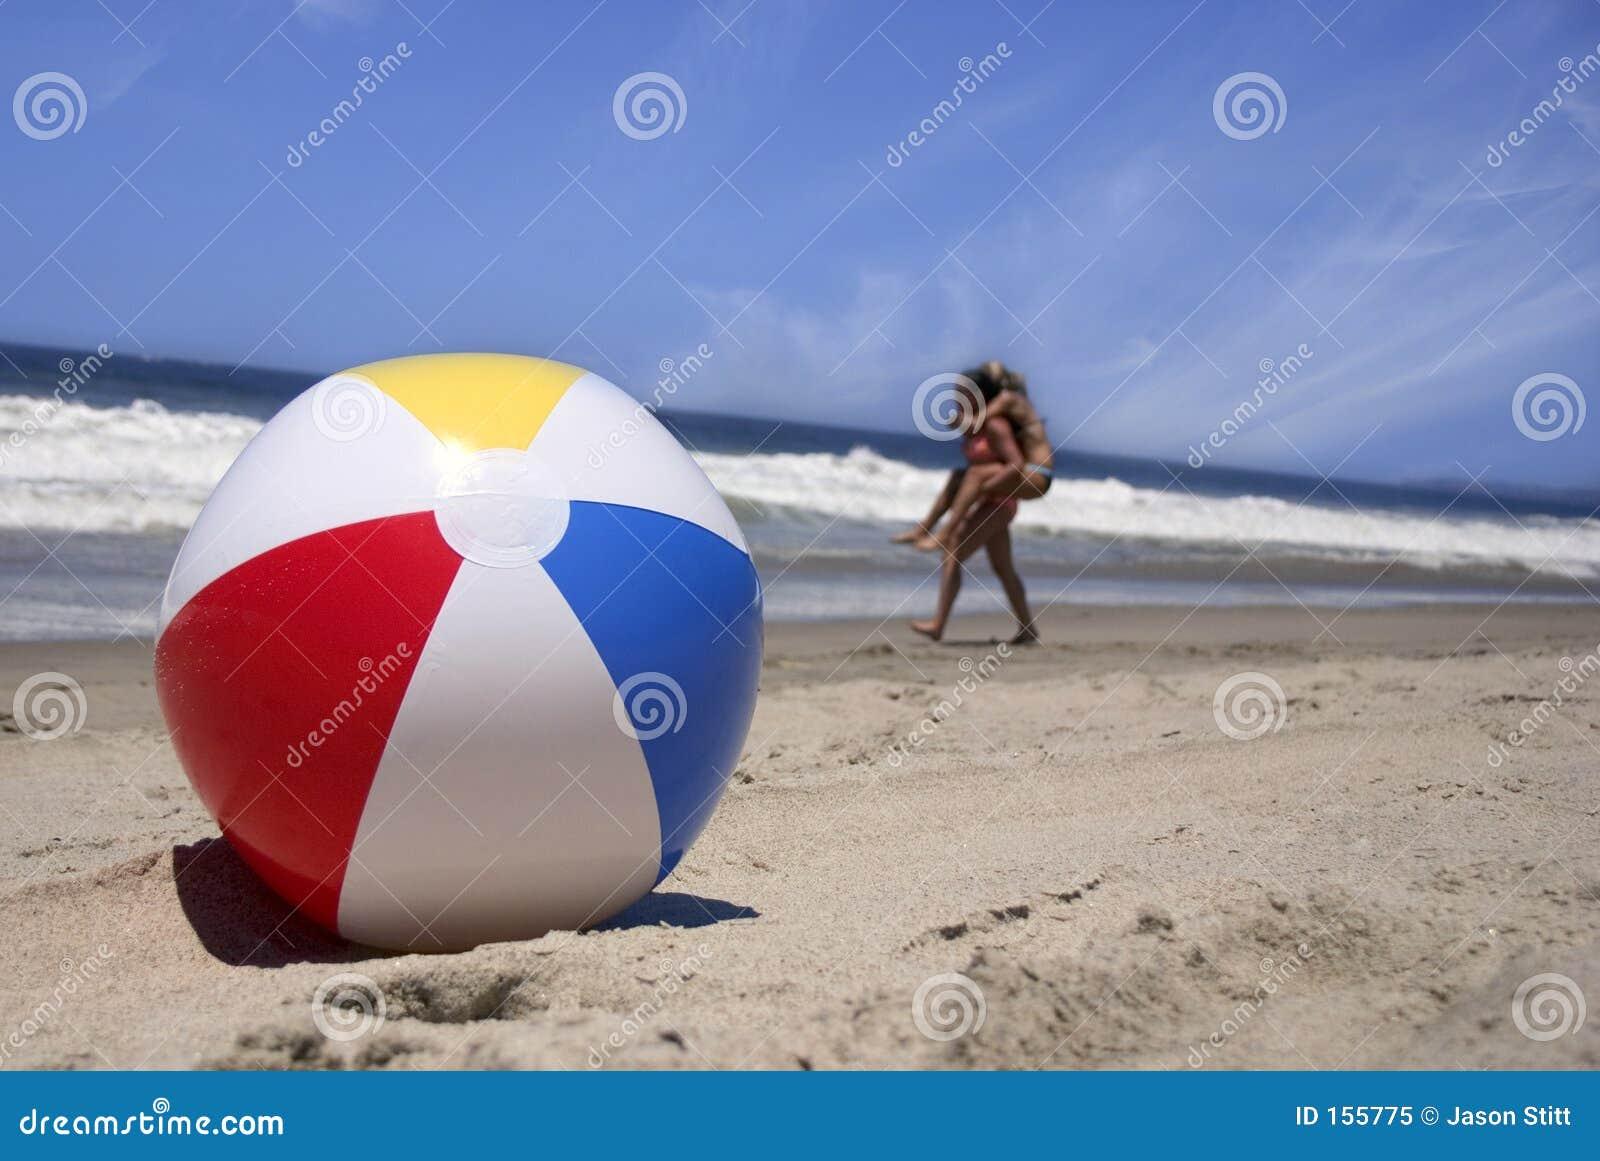 Jaja na plażę